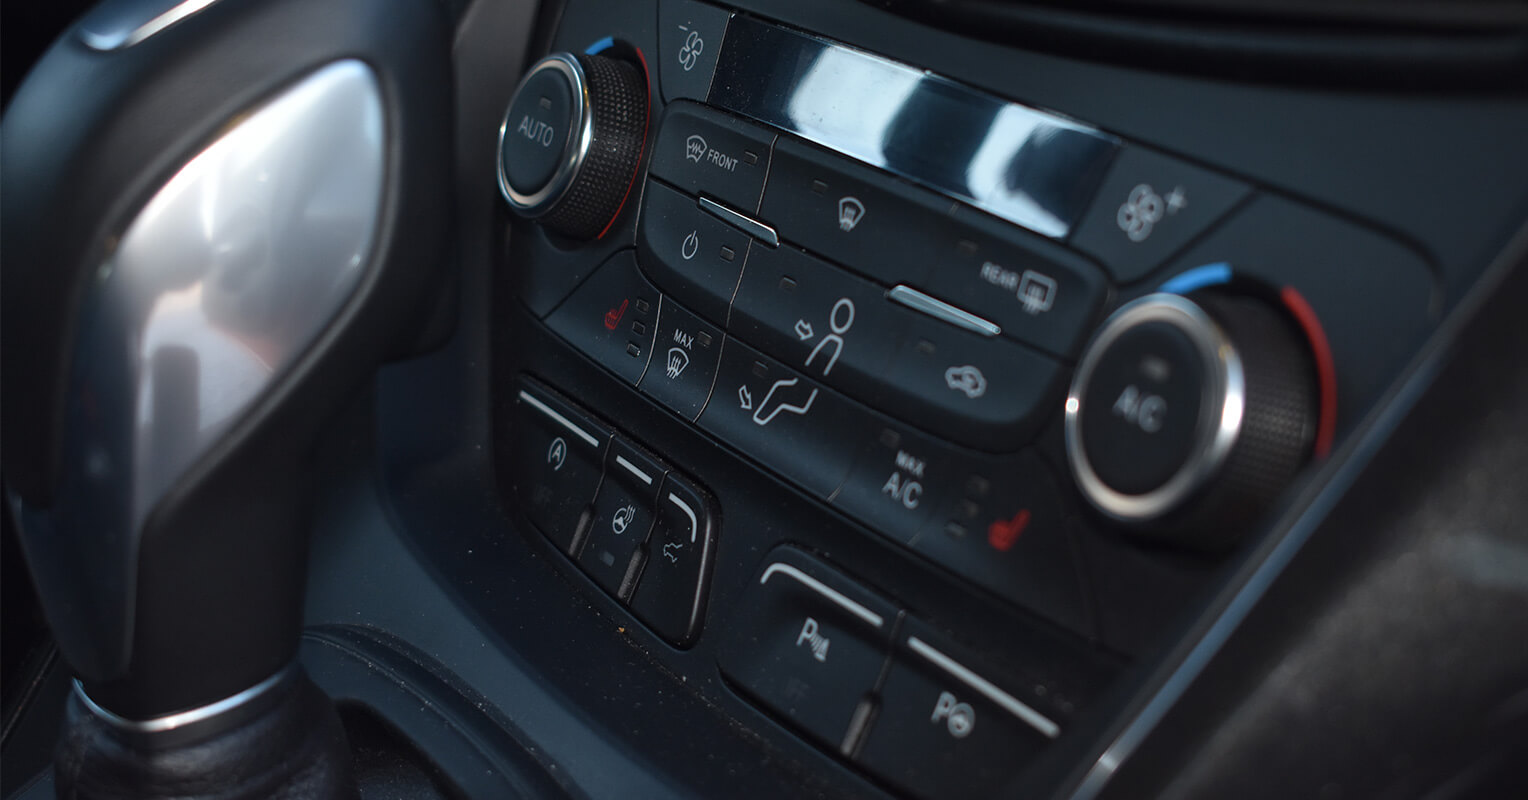 Consola central del Ford Kuga 2018